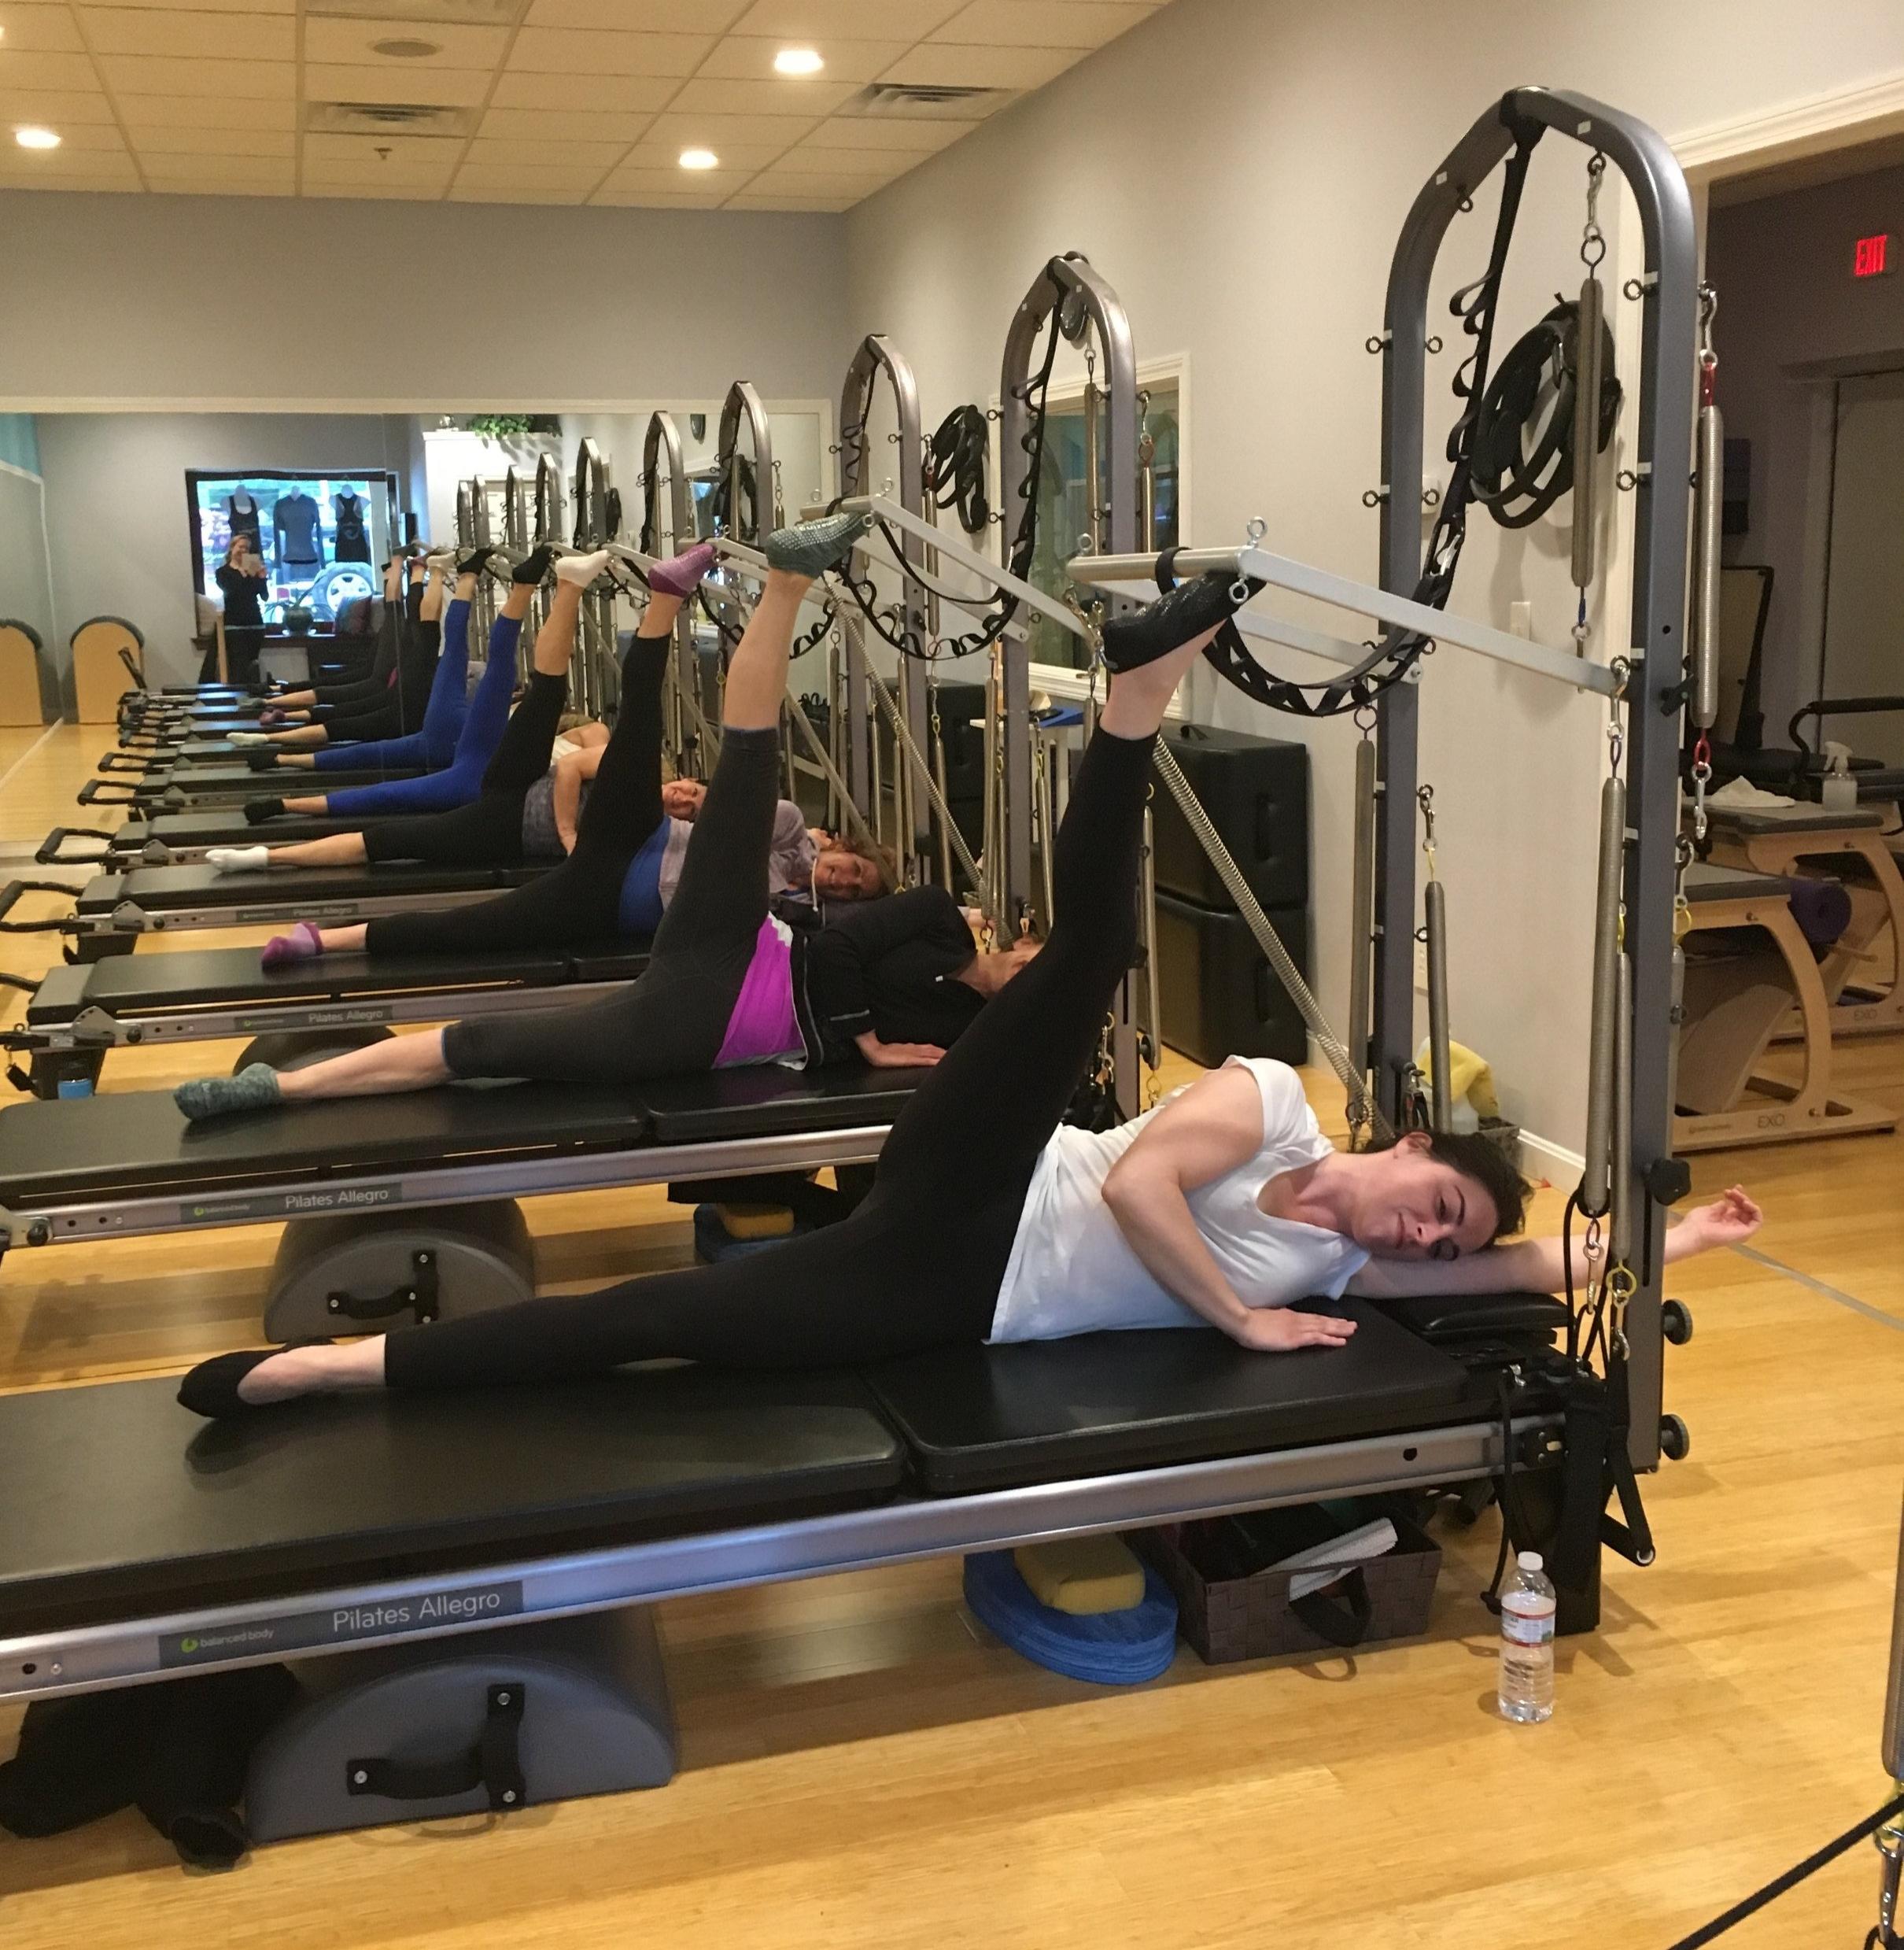 Healthy-Changes-Pilates-Reading-Hip-Opener.JPG